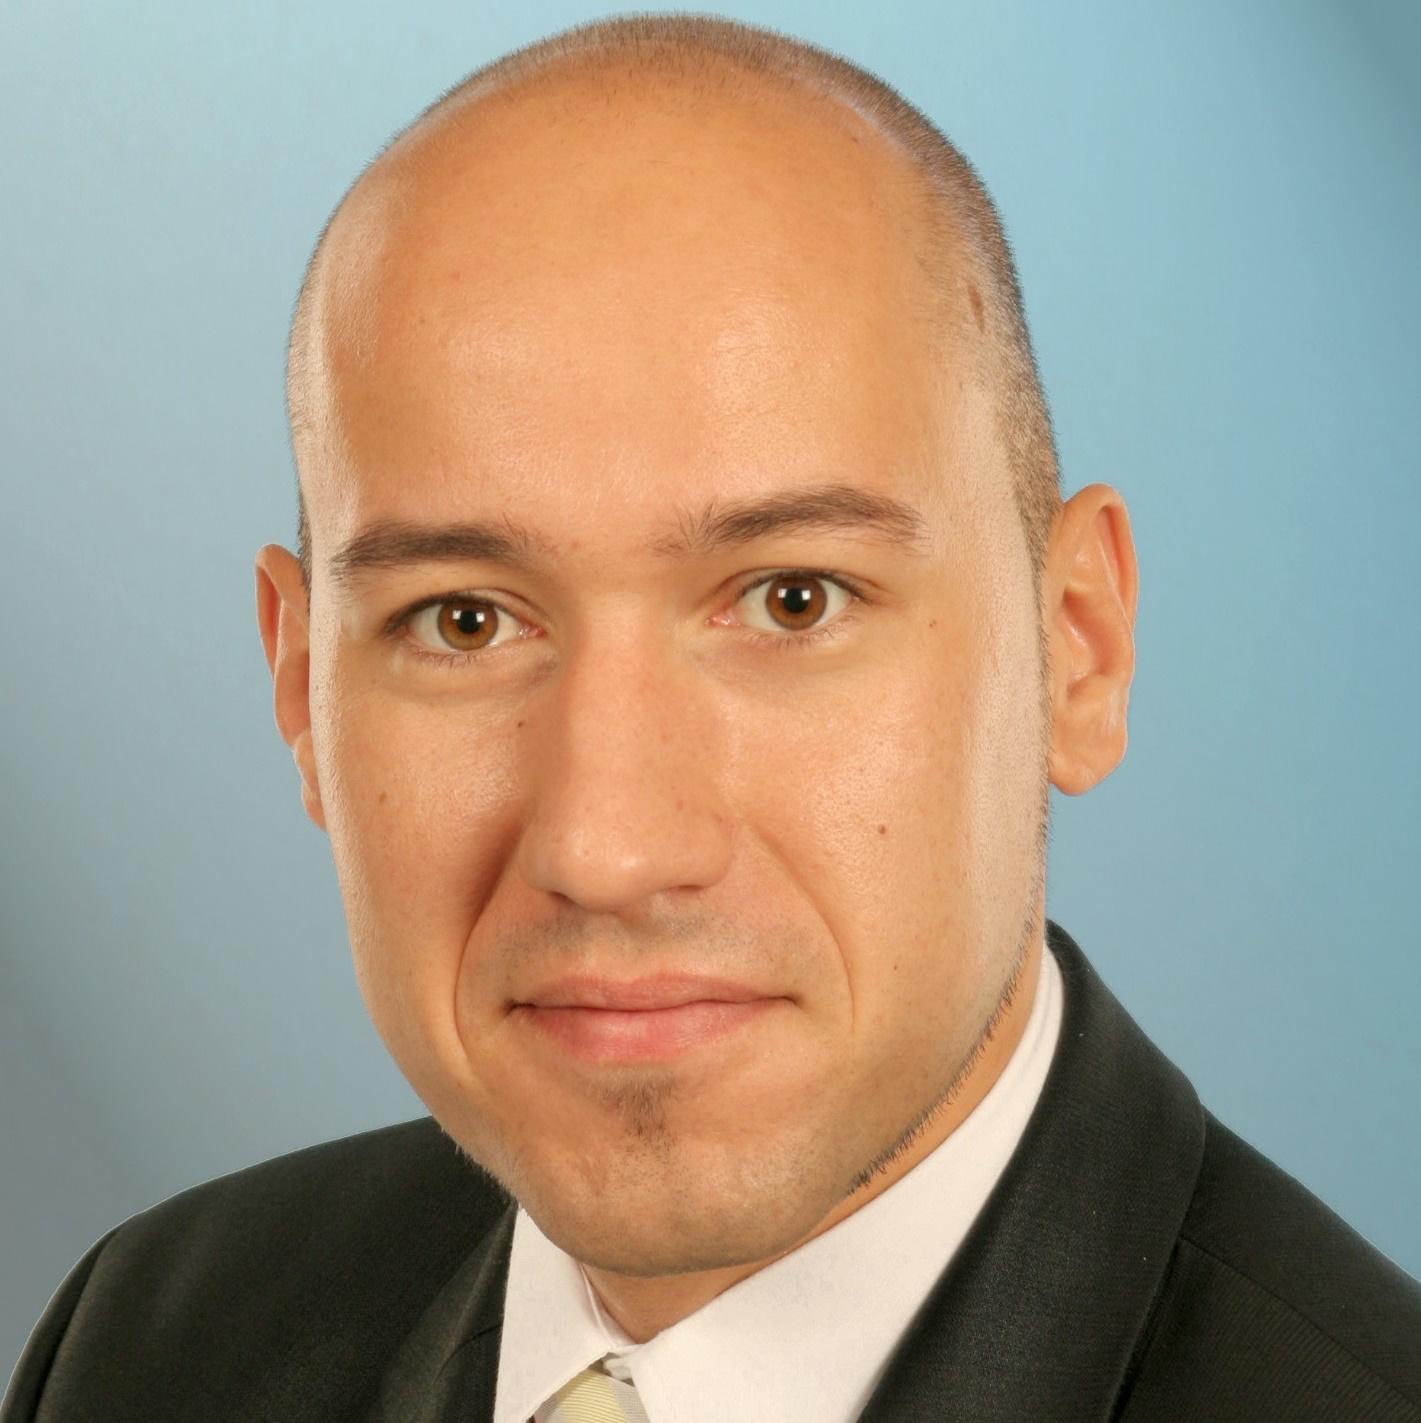 Team - Simon Dietz, Head of Supply Chain Management